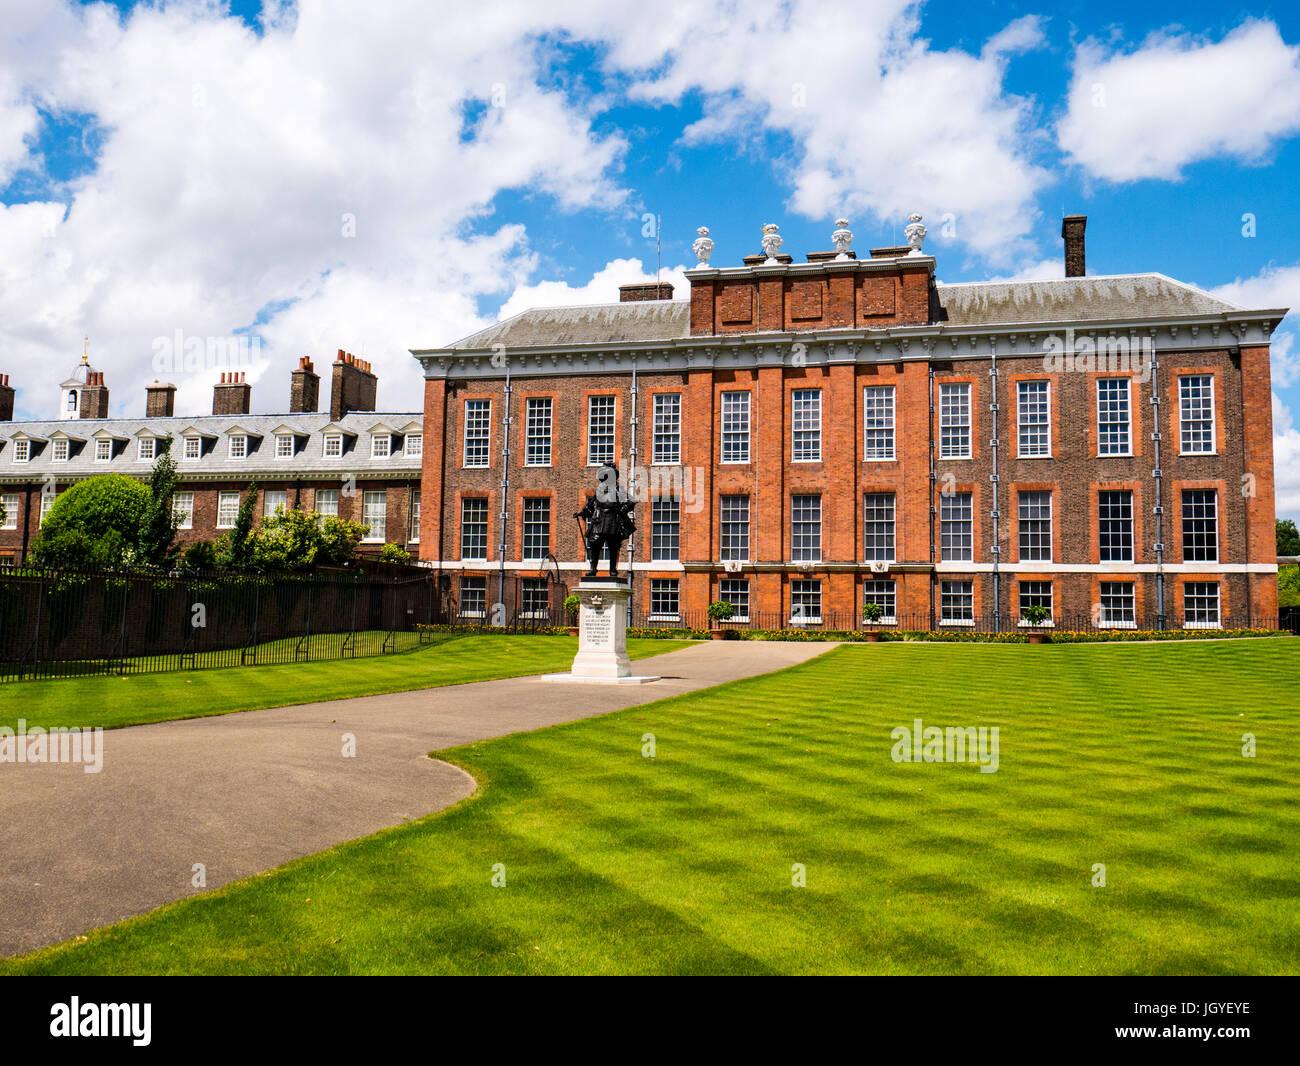 Kensington Palace, Kensington Gardens, Londres, Angleterre, RU, FR. Photo Stock